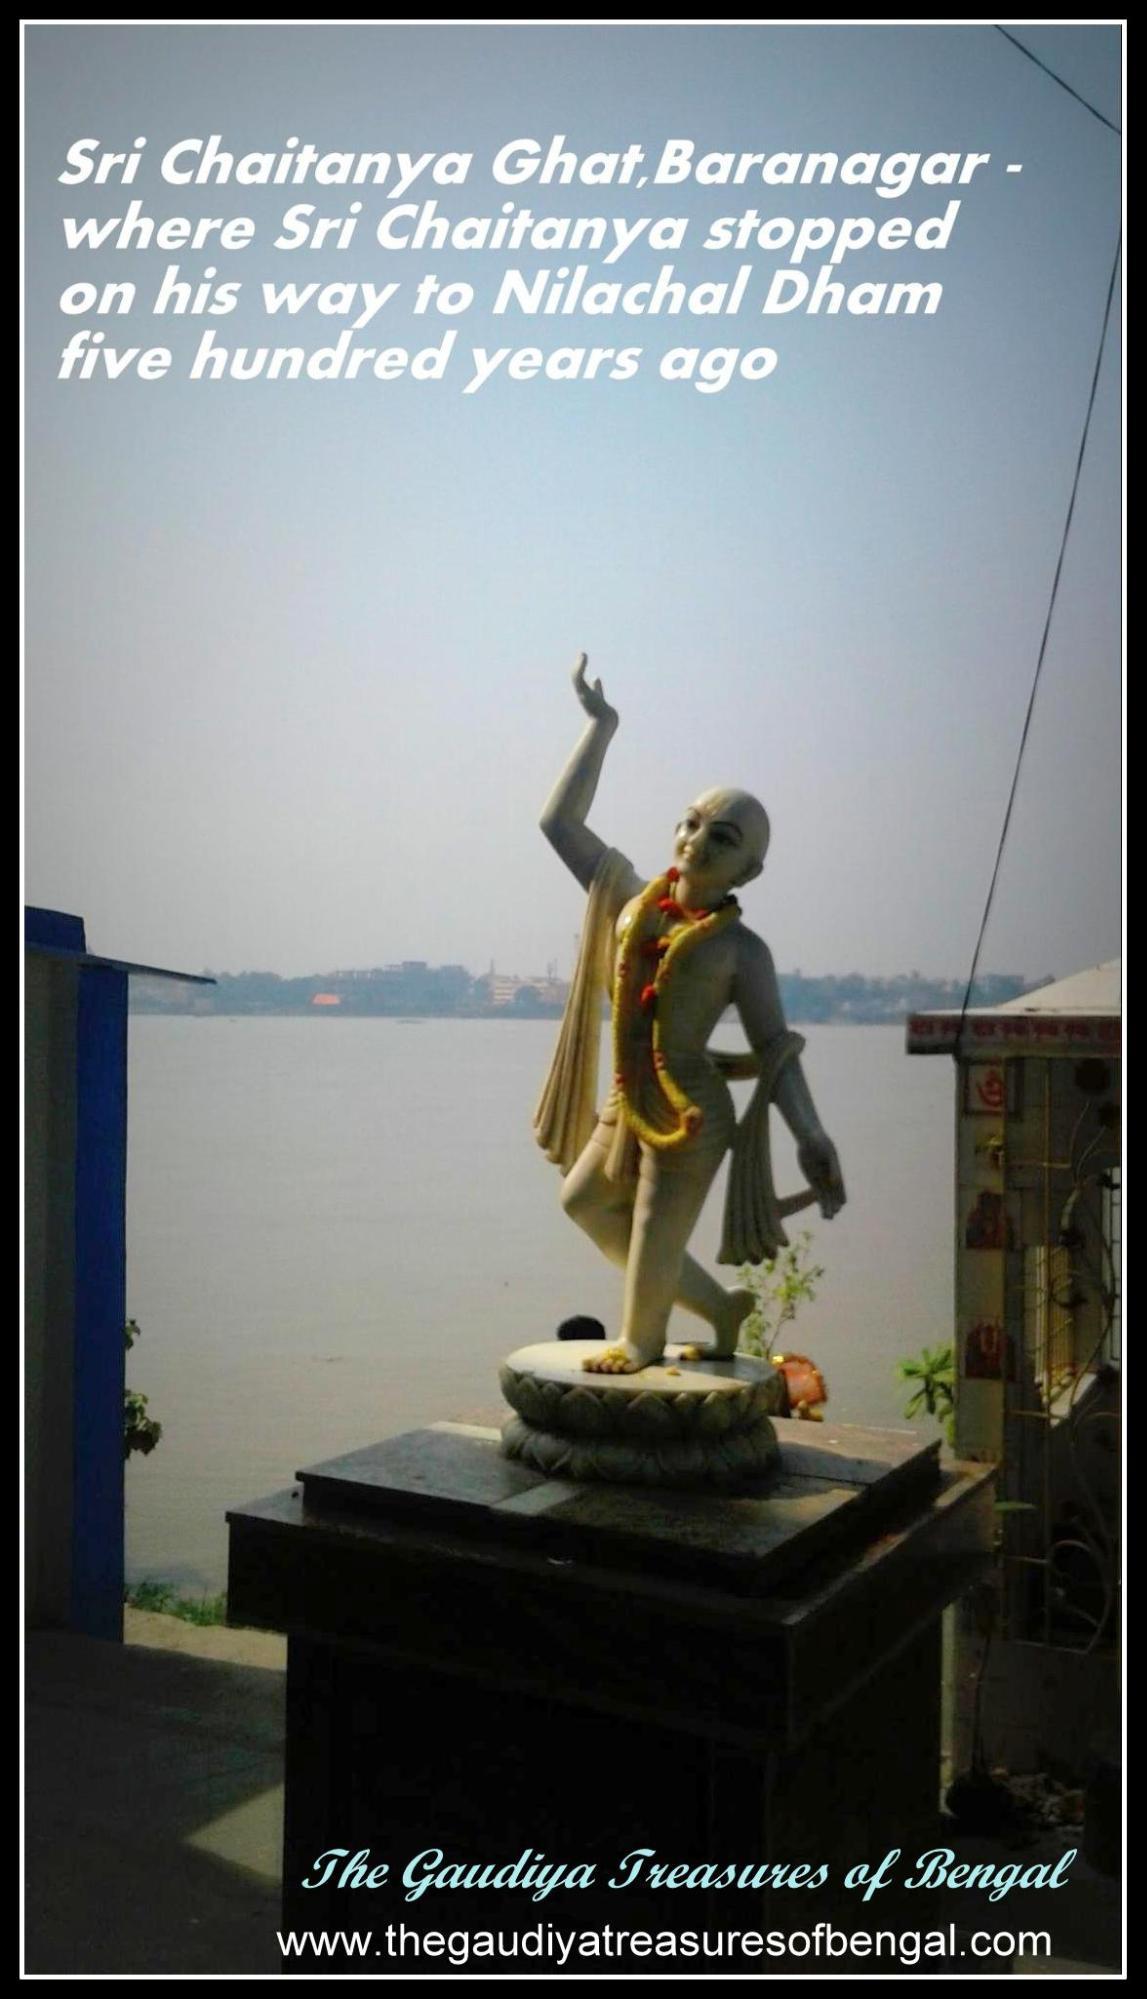 baranagar ghat